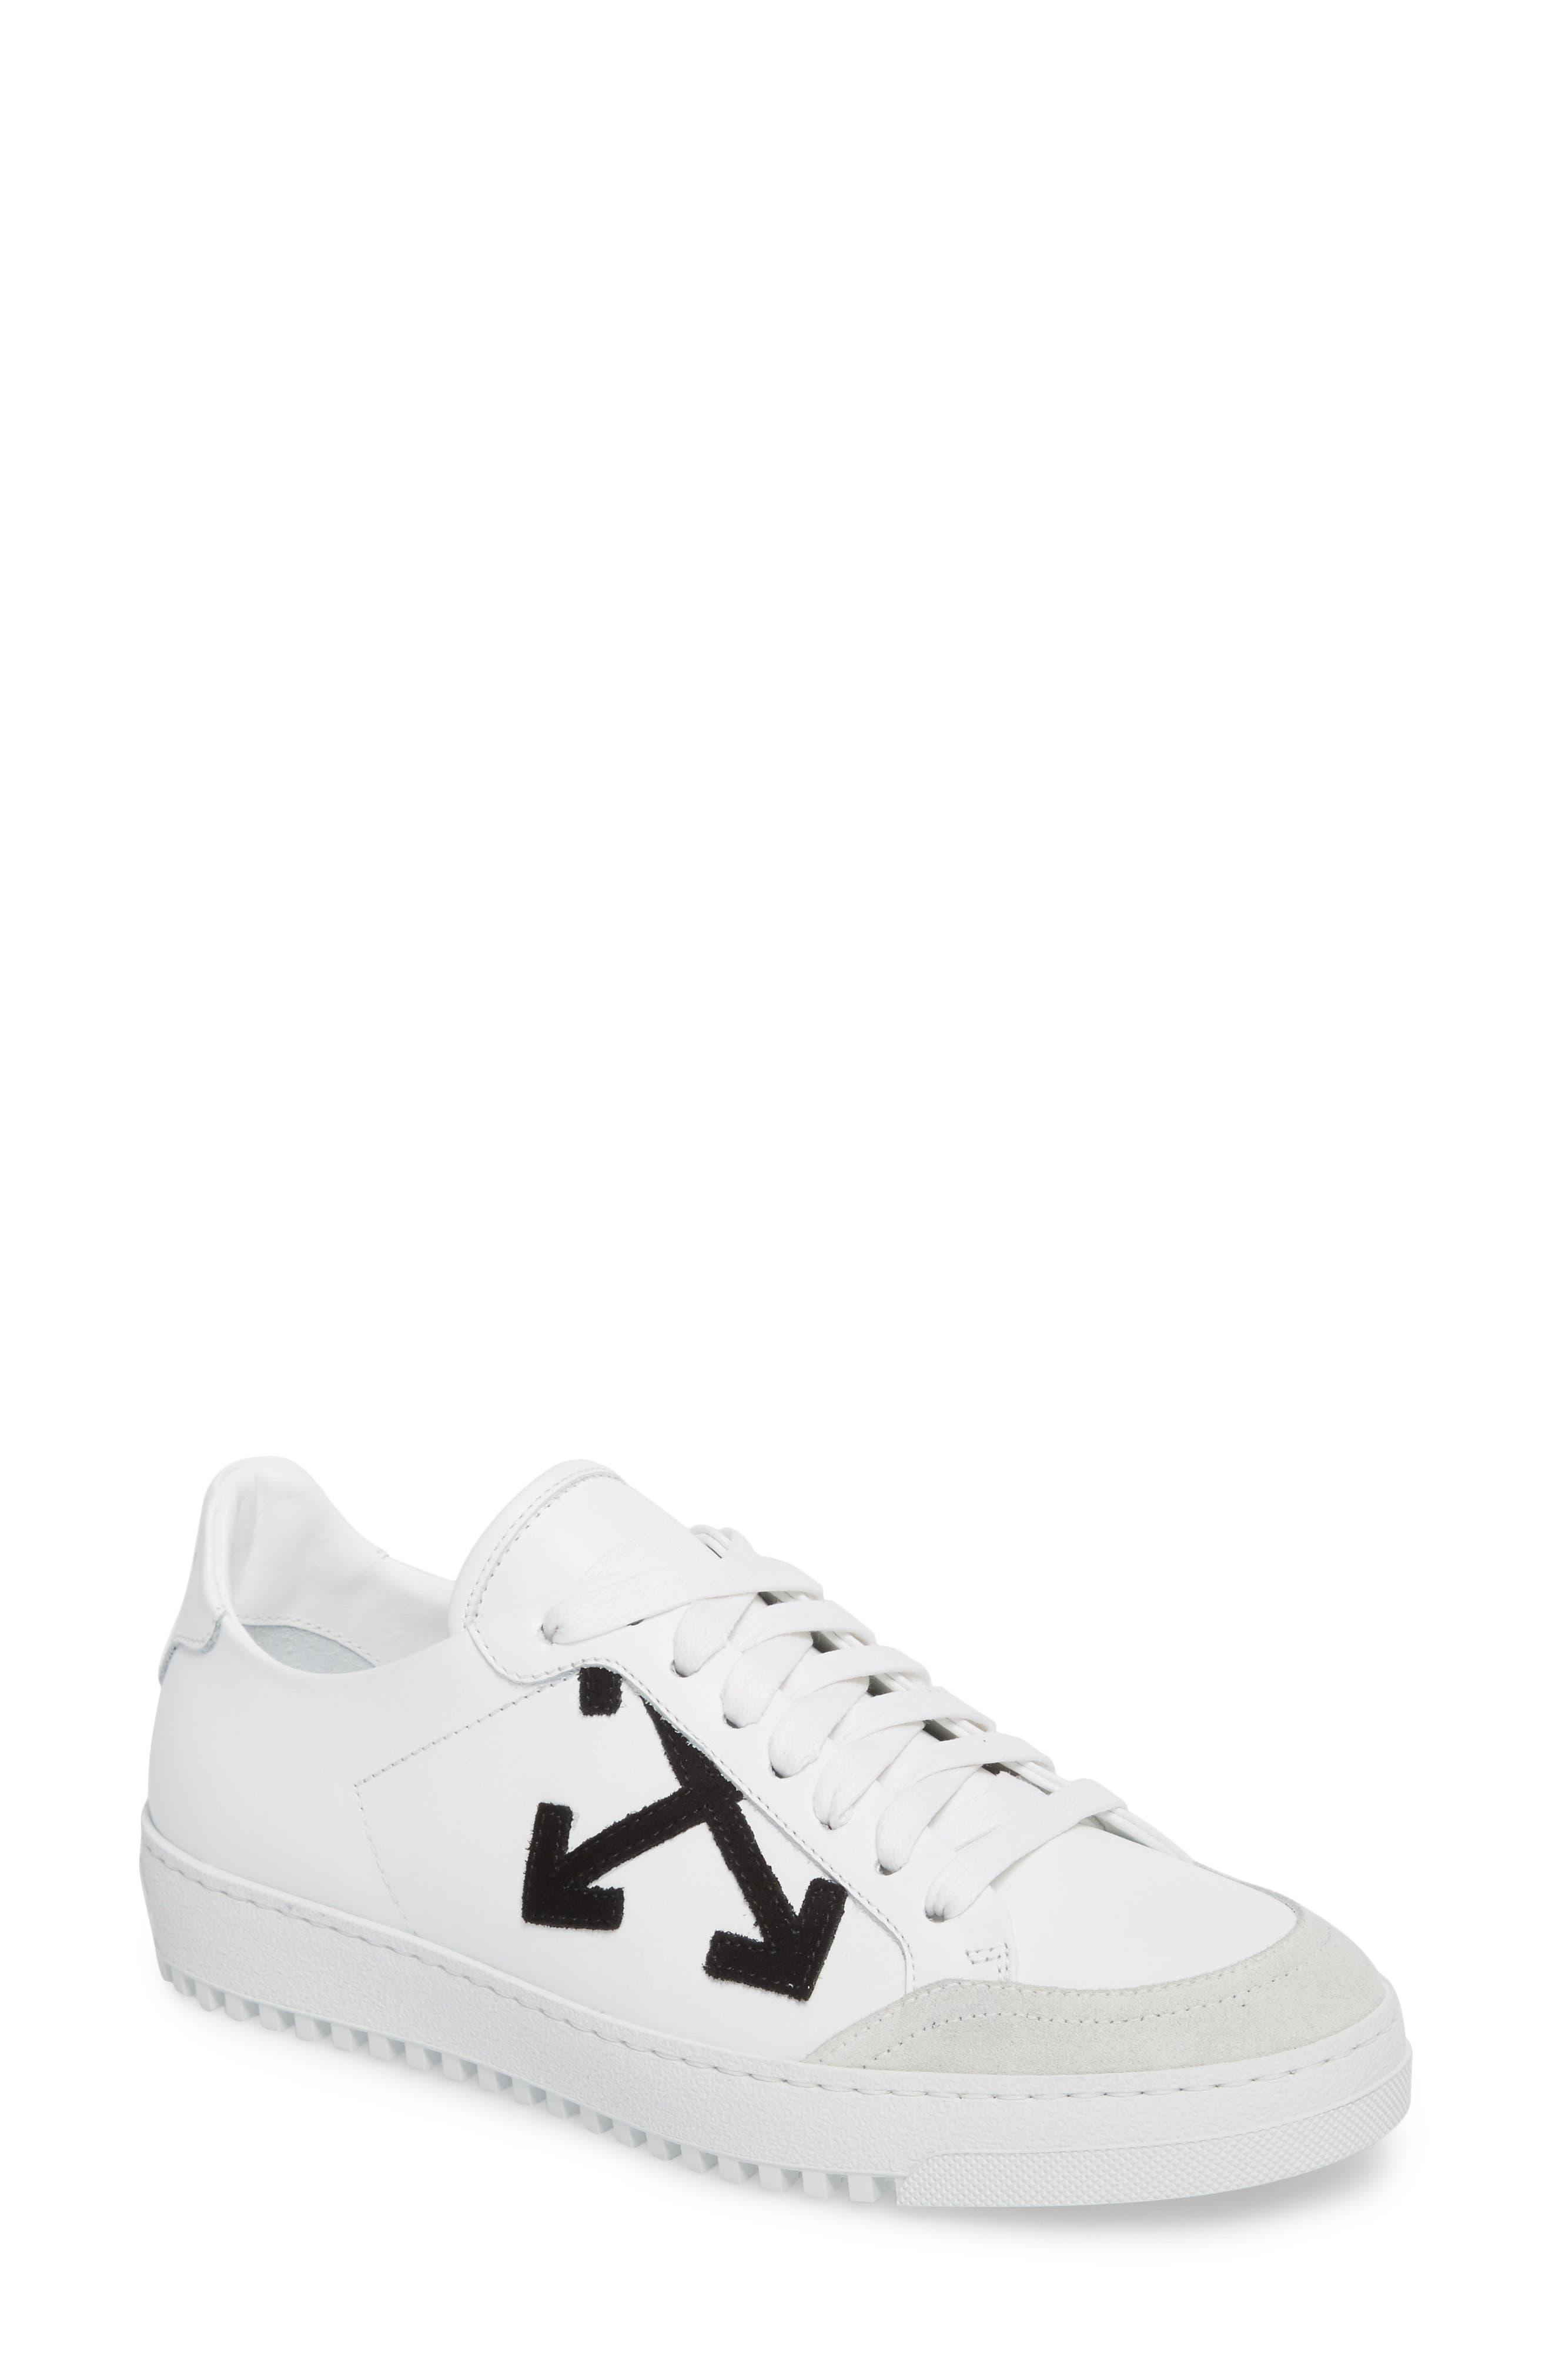 Alternate Image 1 Selected - Off-White Arrow Sneaker (Women)